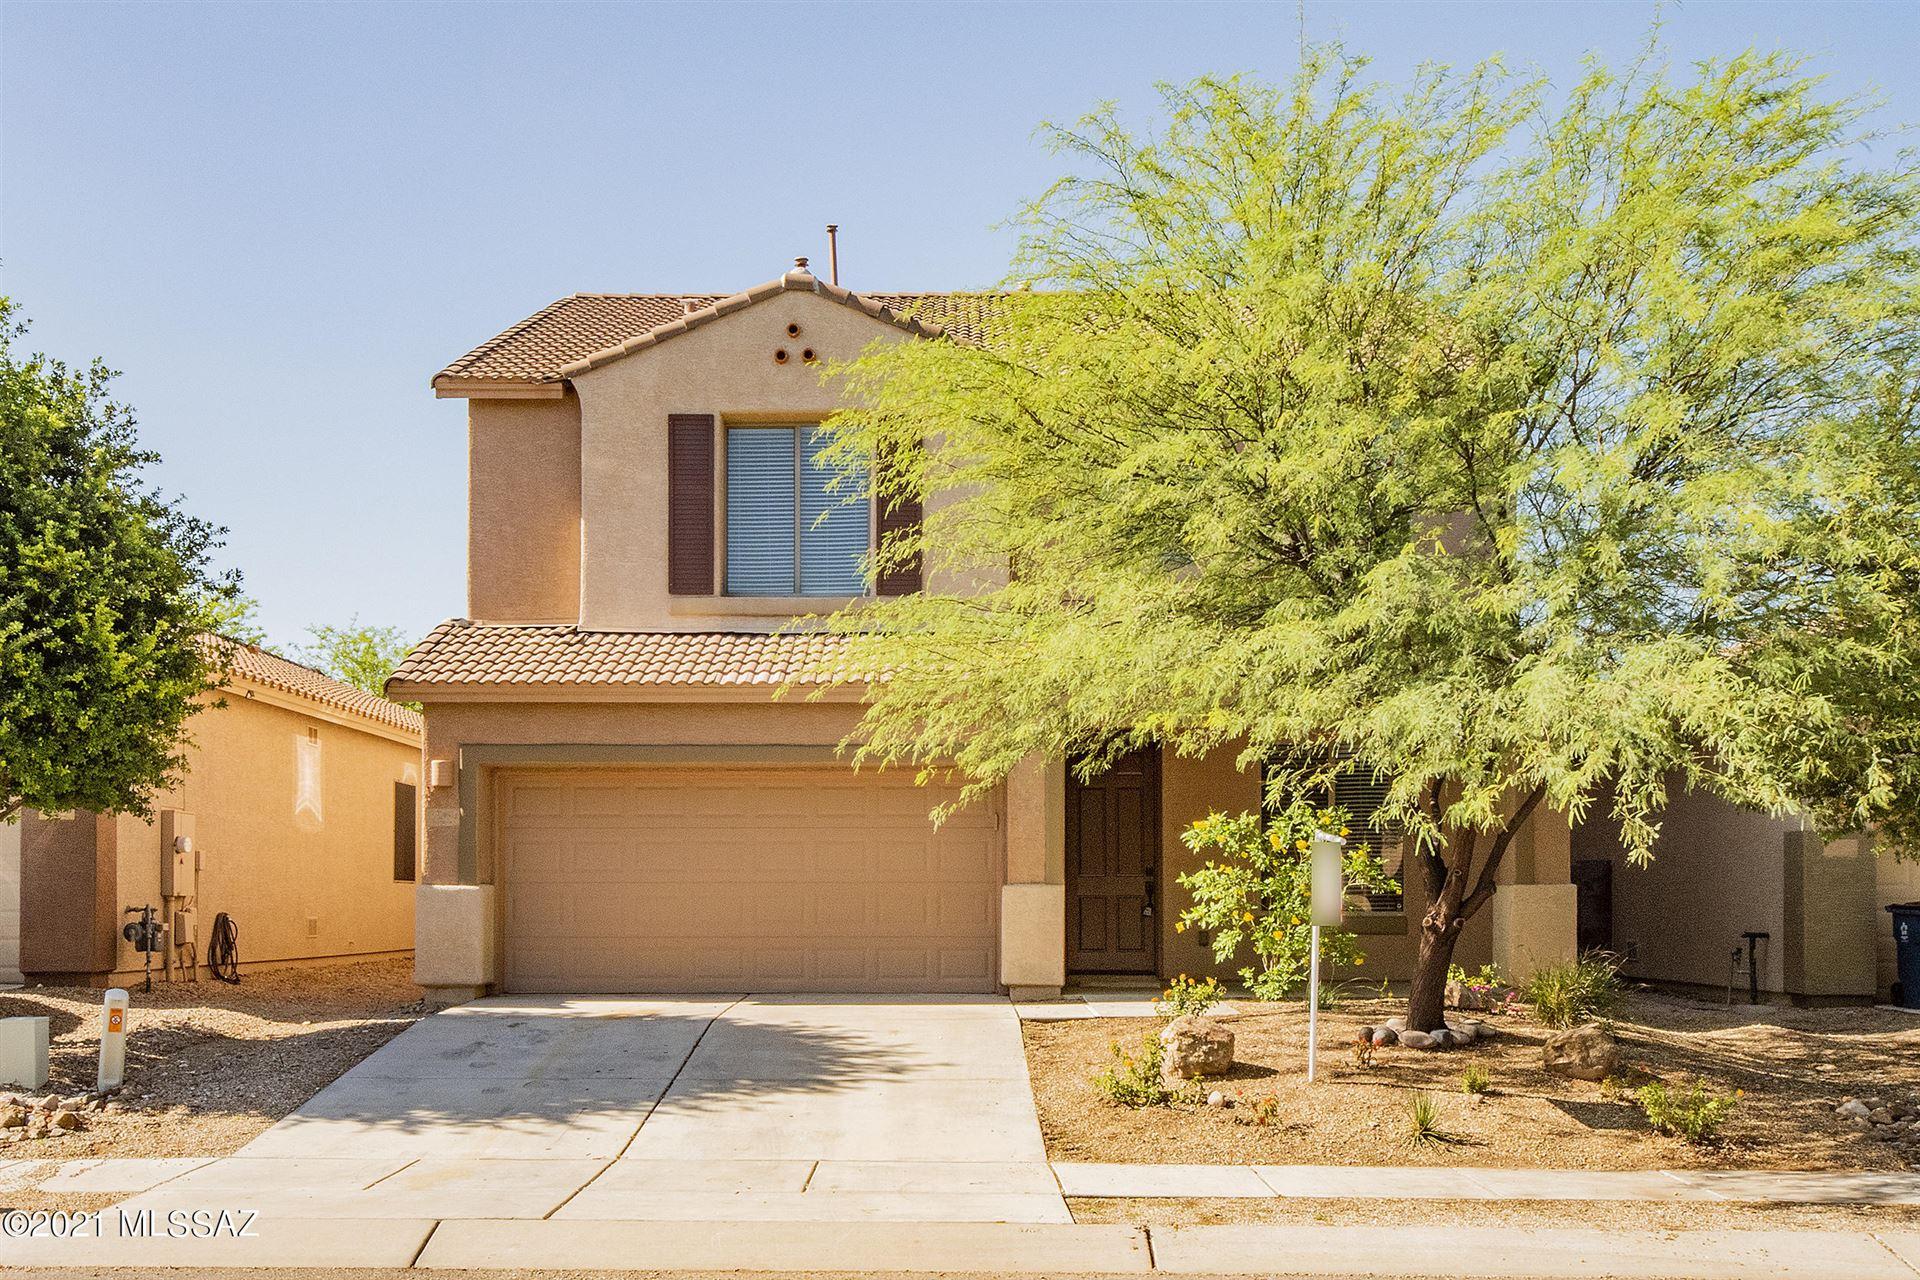 12554 E RED IRON Trail, Vail, AZ 85641 - MLS#: 22119937